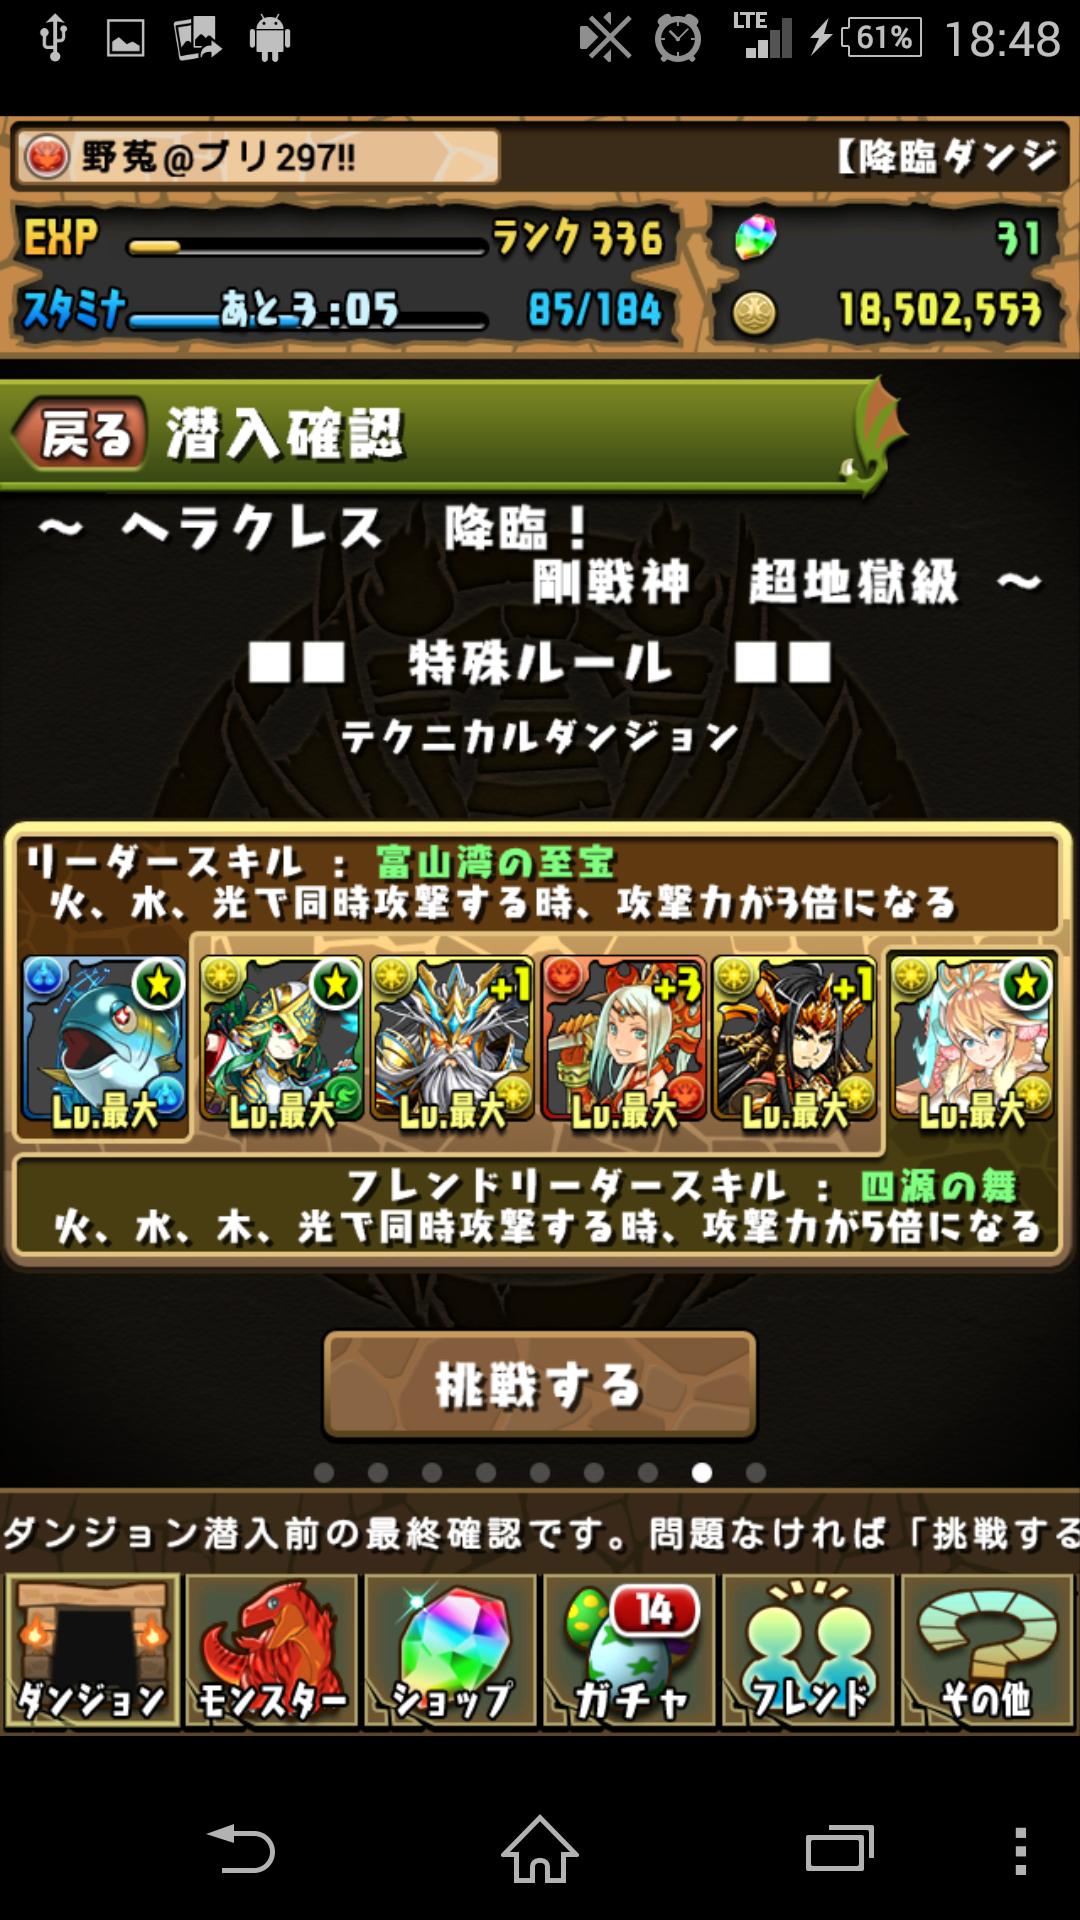 Screenshot_2014-09-09-18-48-01.png